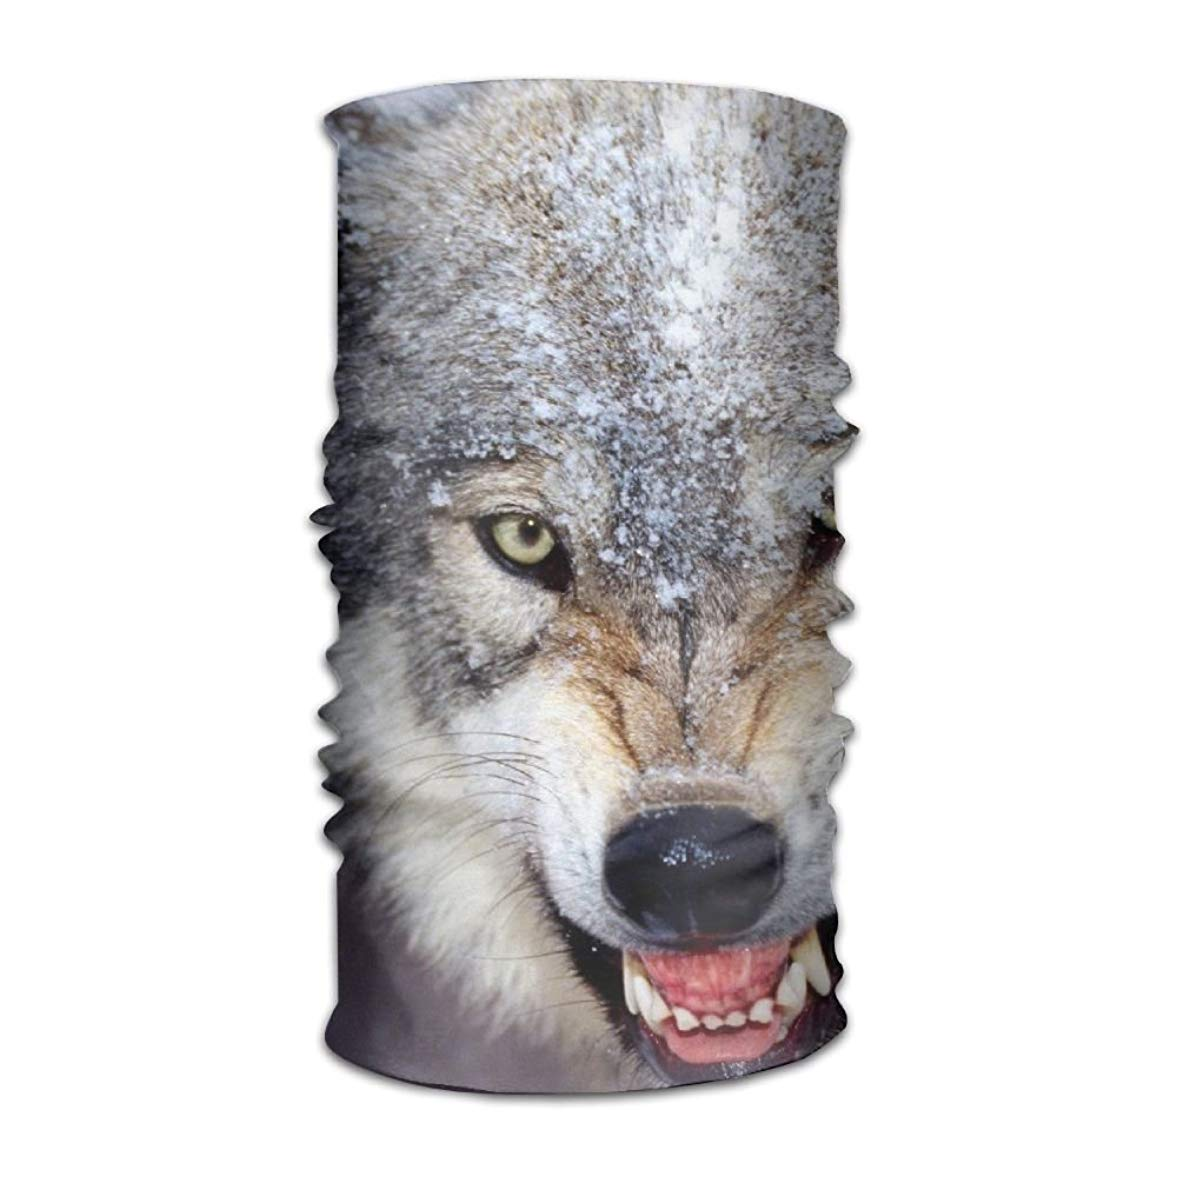 NDJHEH Go Wolf Headwear Bandanas Seamless Headscarf Outdoor Sport Headdress Running Riding Skiing Hiking Headbands